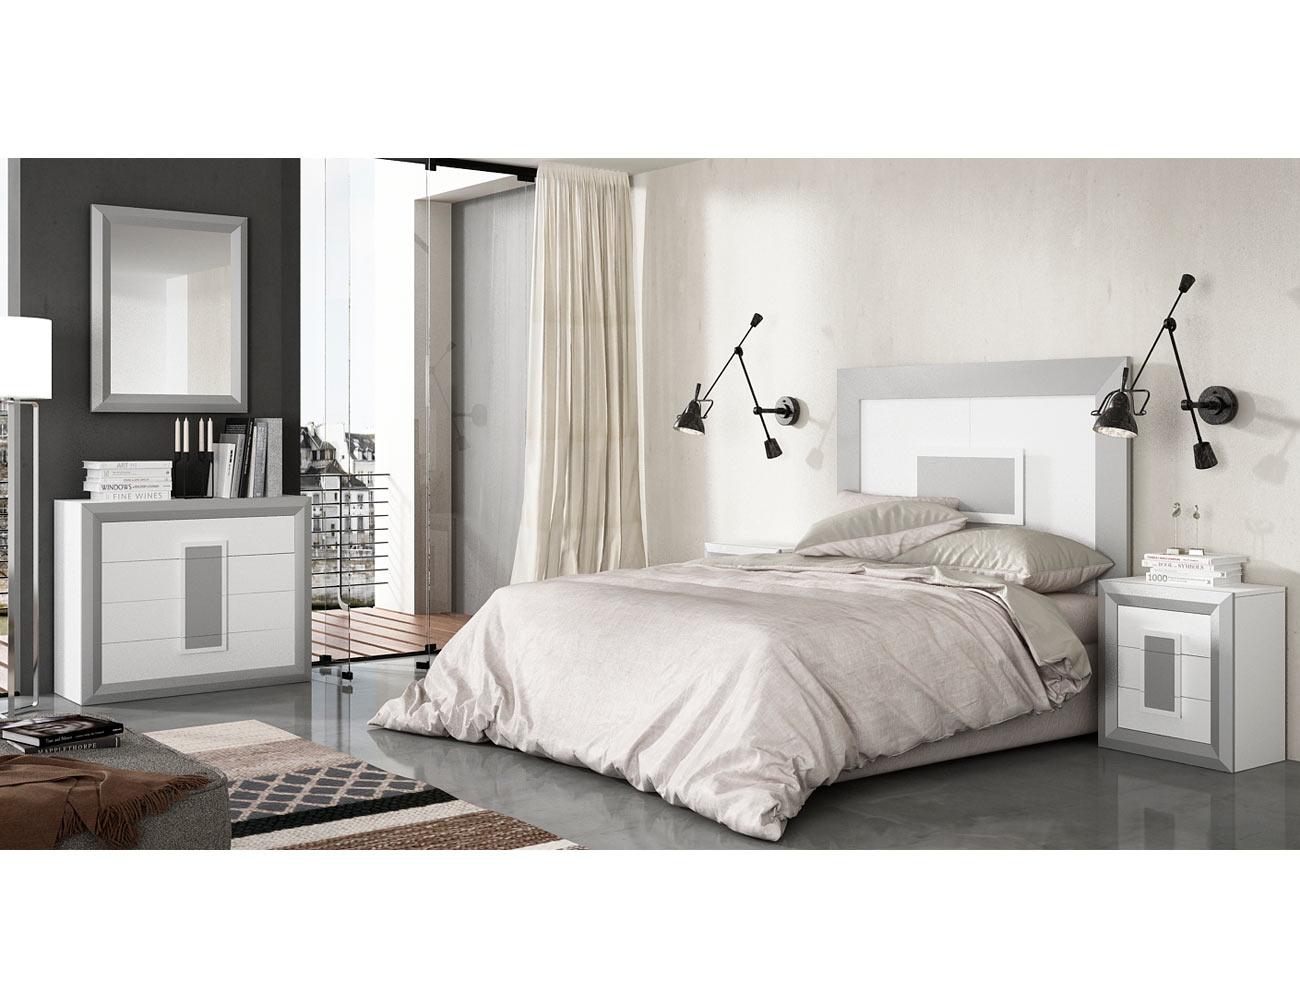 Ambiente 08 dormitorio matrimonio comoda1